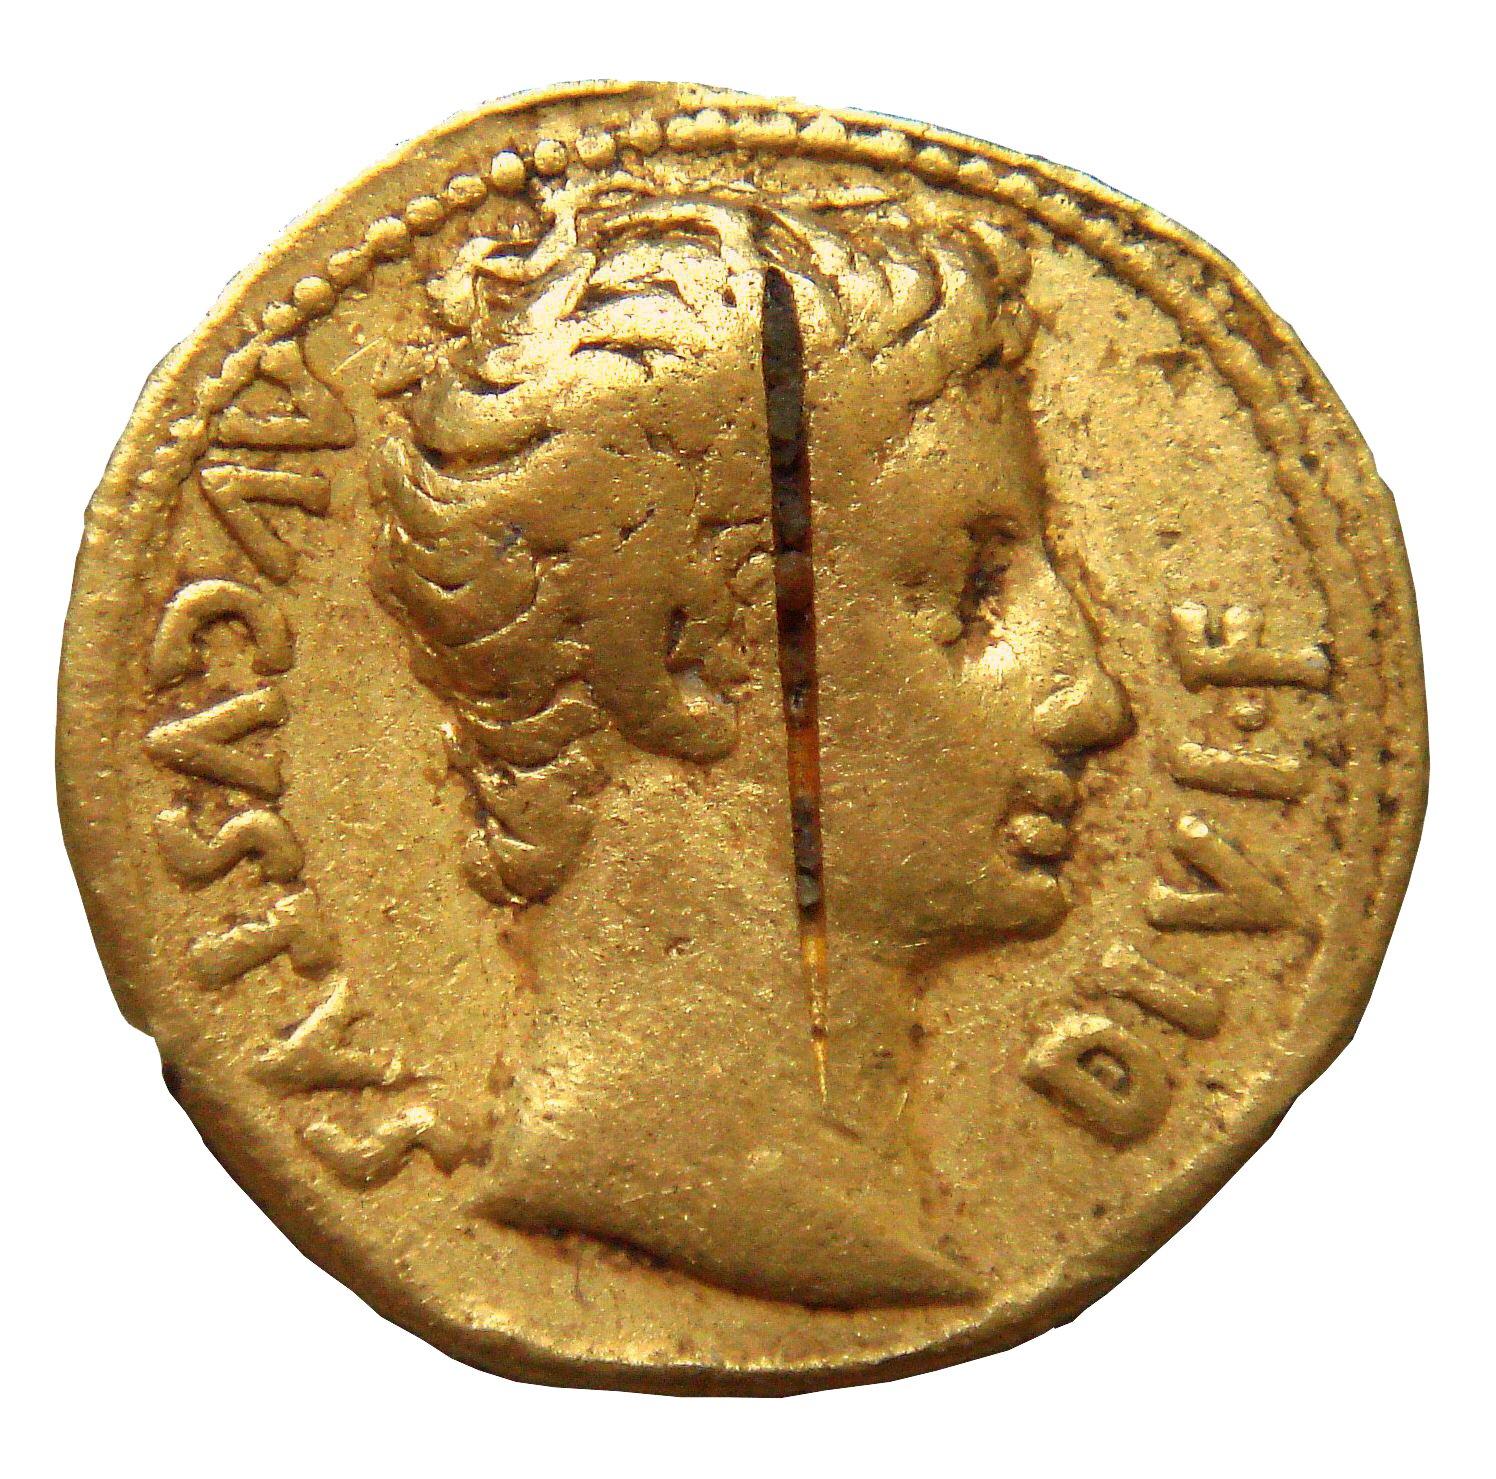 Moneta zpodobiznąOktawiana Augusta Moneta zpodobiznąOktawiana Augusta Źródło: PHGCOM, Wikimedia Commons, licencja: CC BY-SA 3.0.